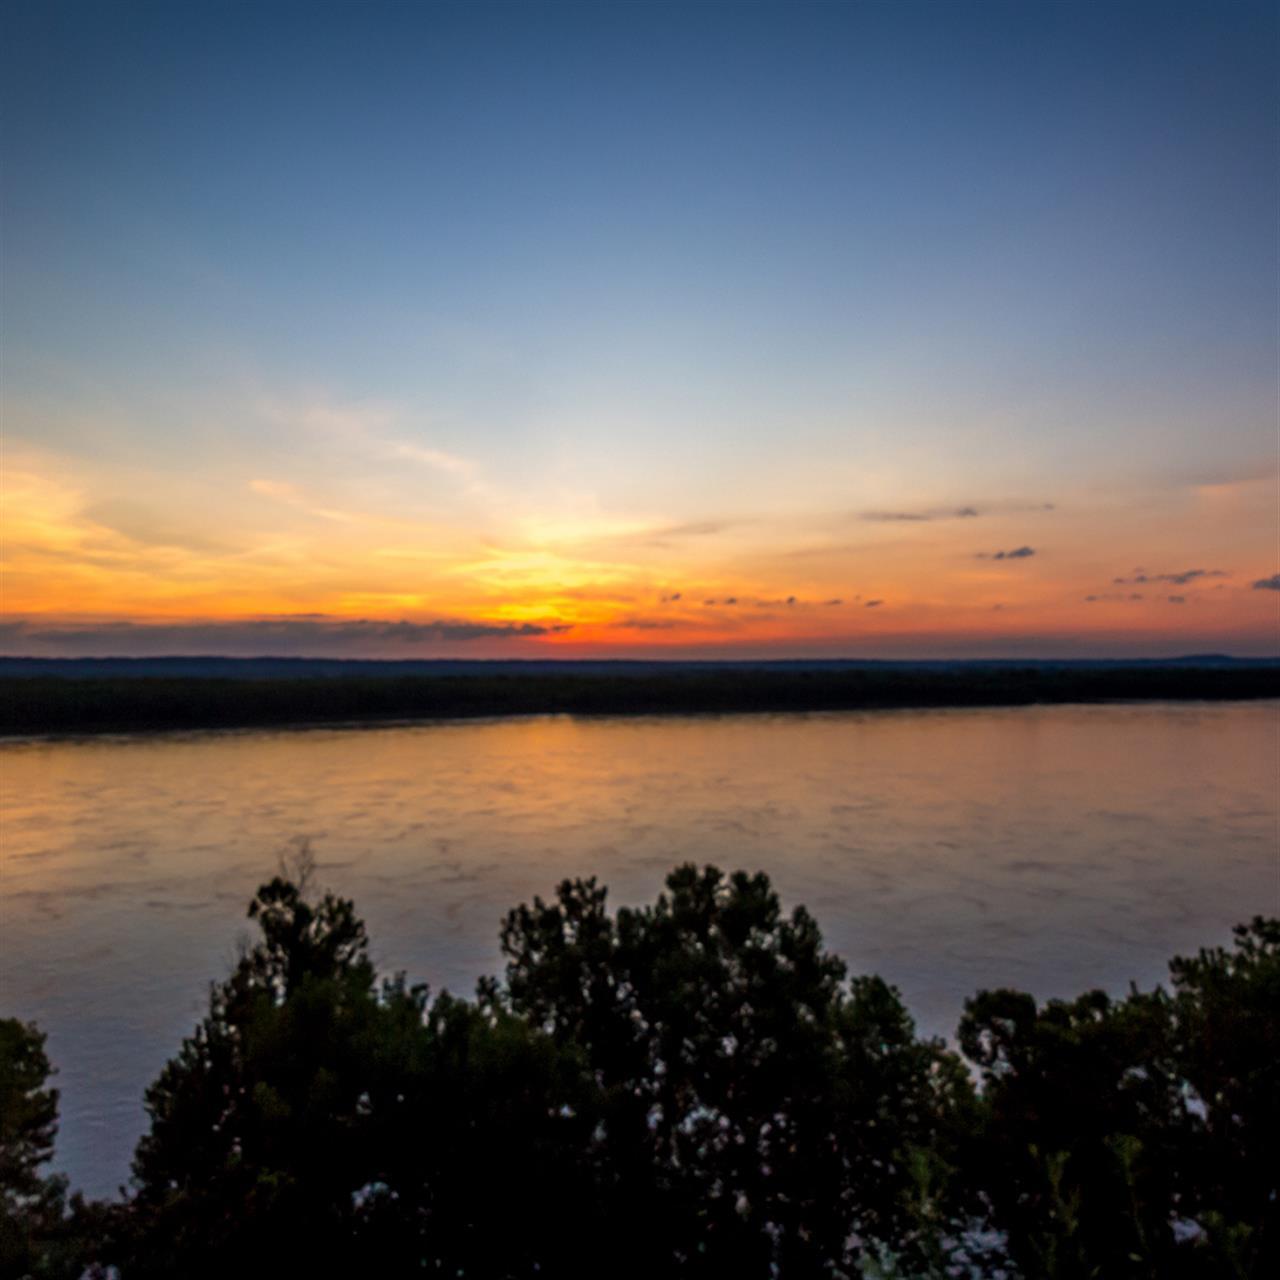 #LeadingRElocal #MississippiRiver #Sunrise #TrailofTearsStatePark #JacksonMO